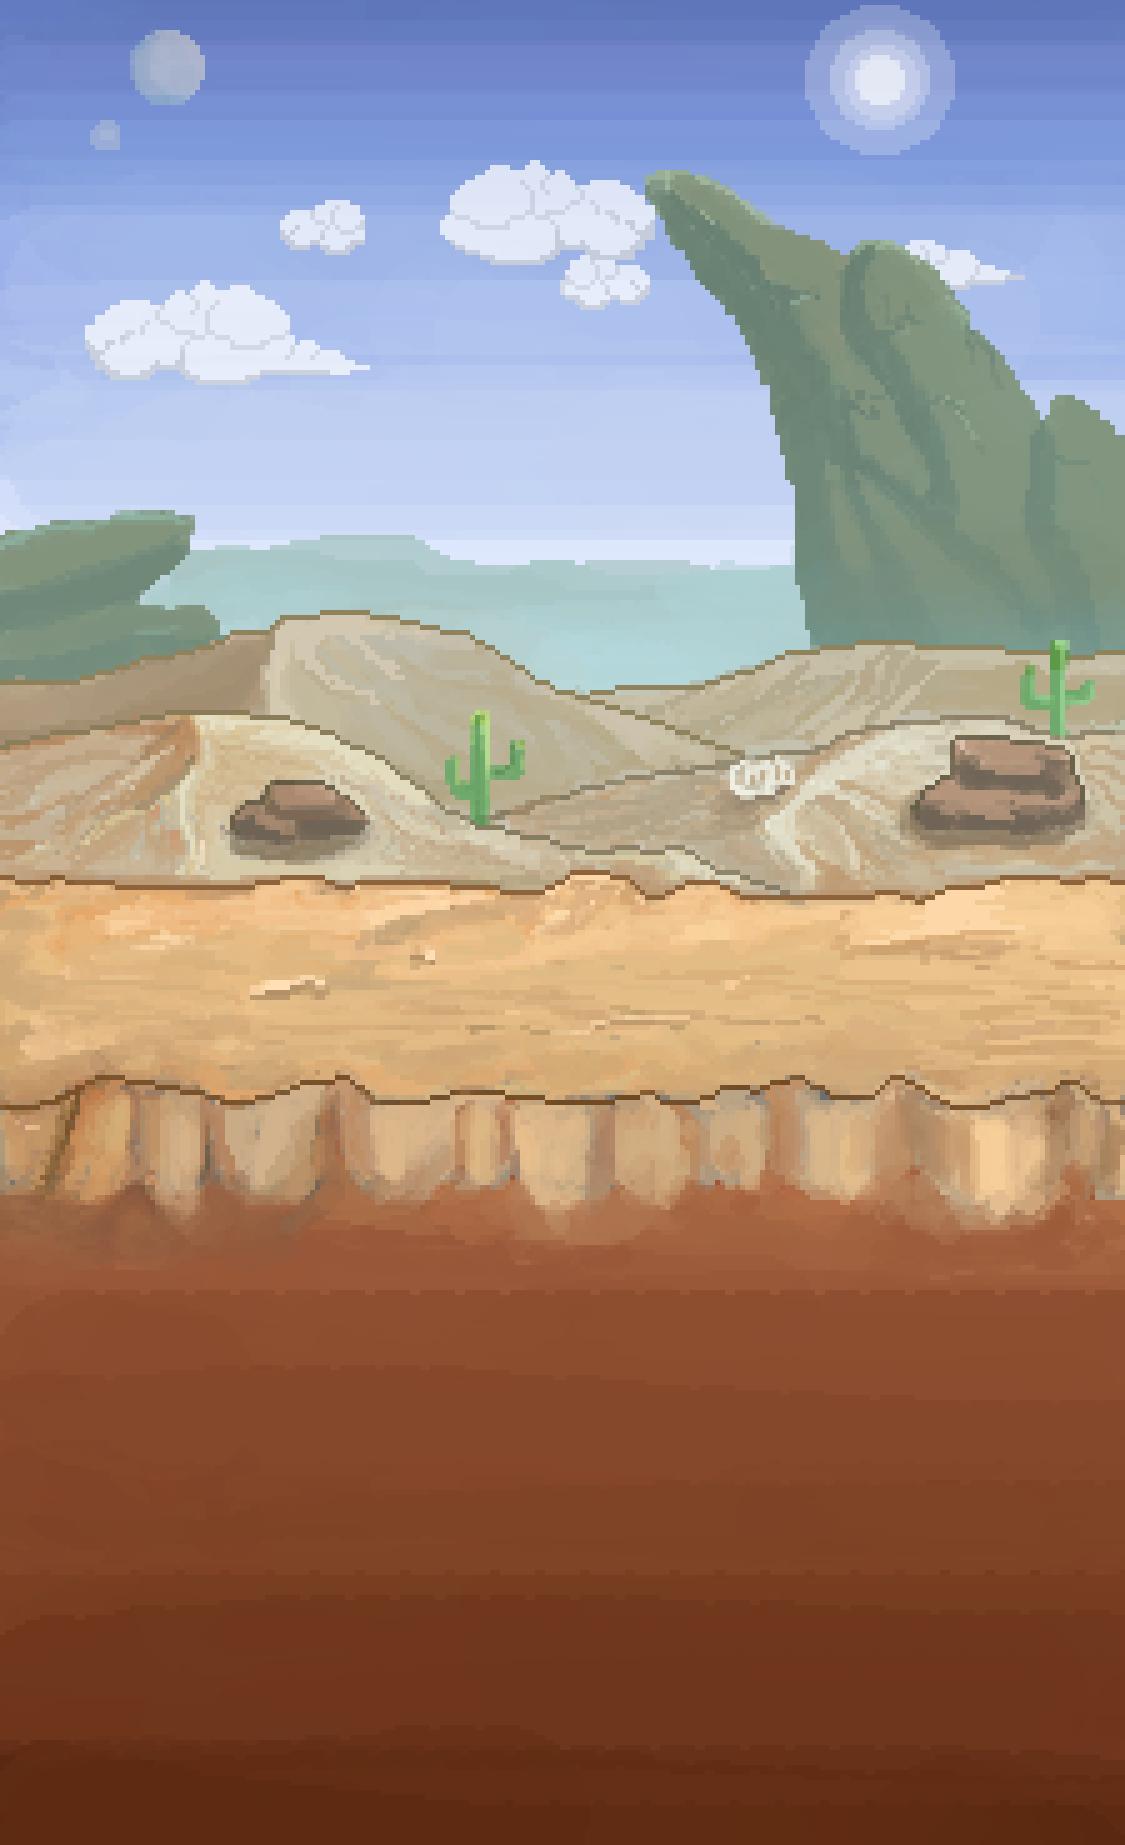 2D Game Backround Art